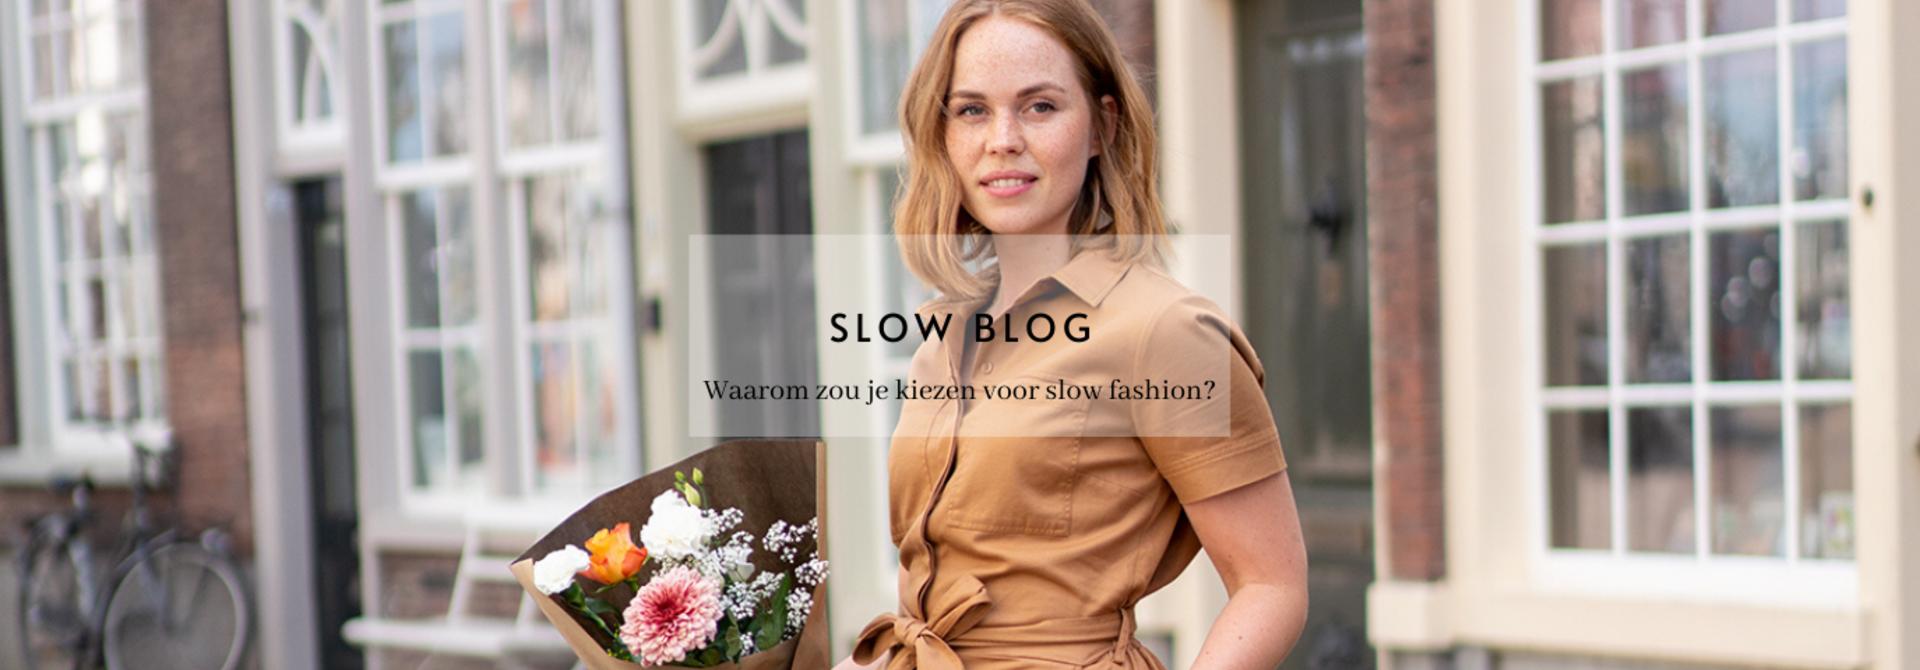 Waarom zou je kiezen voor slow fashion?